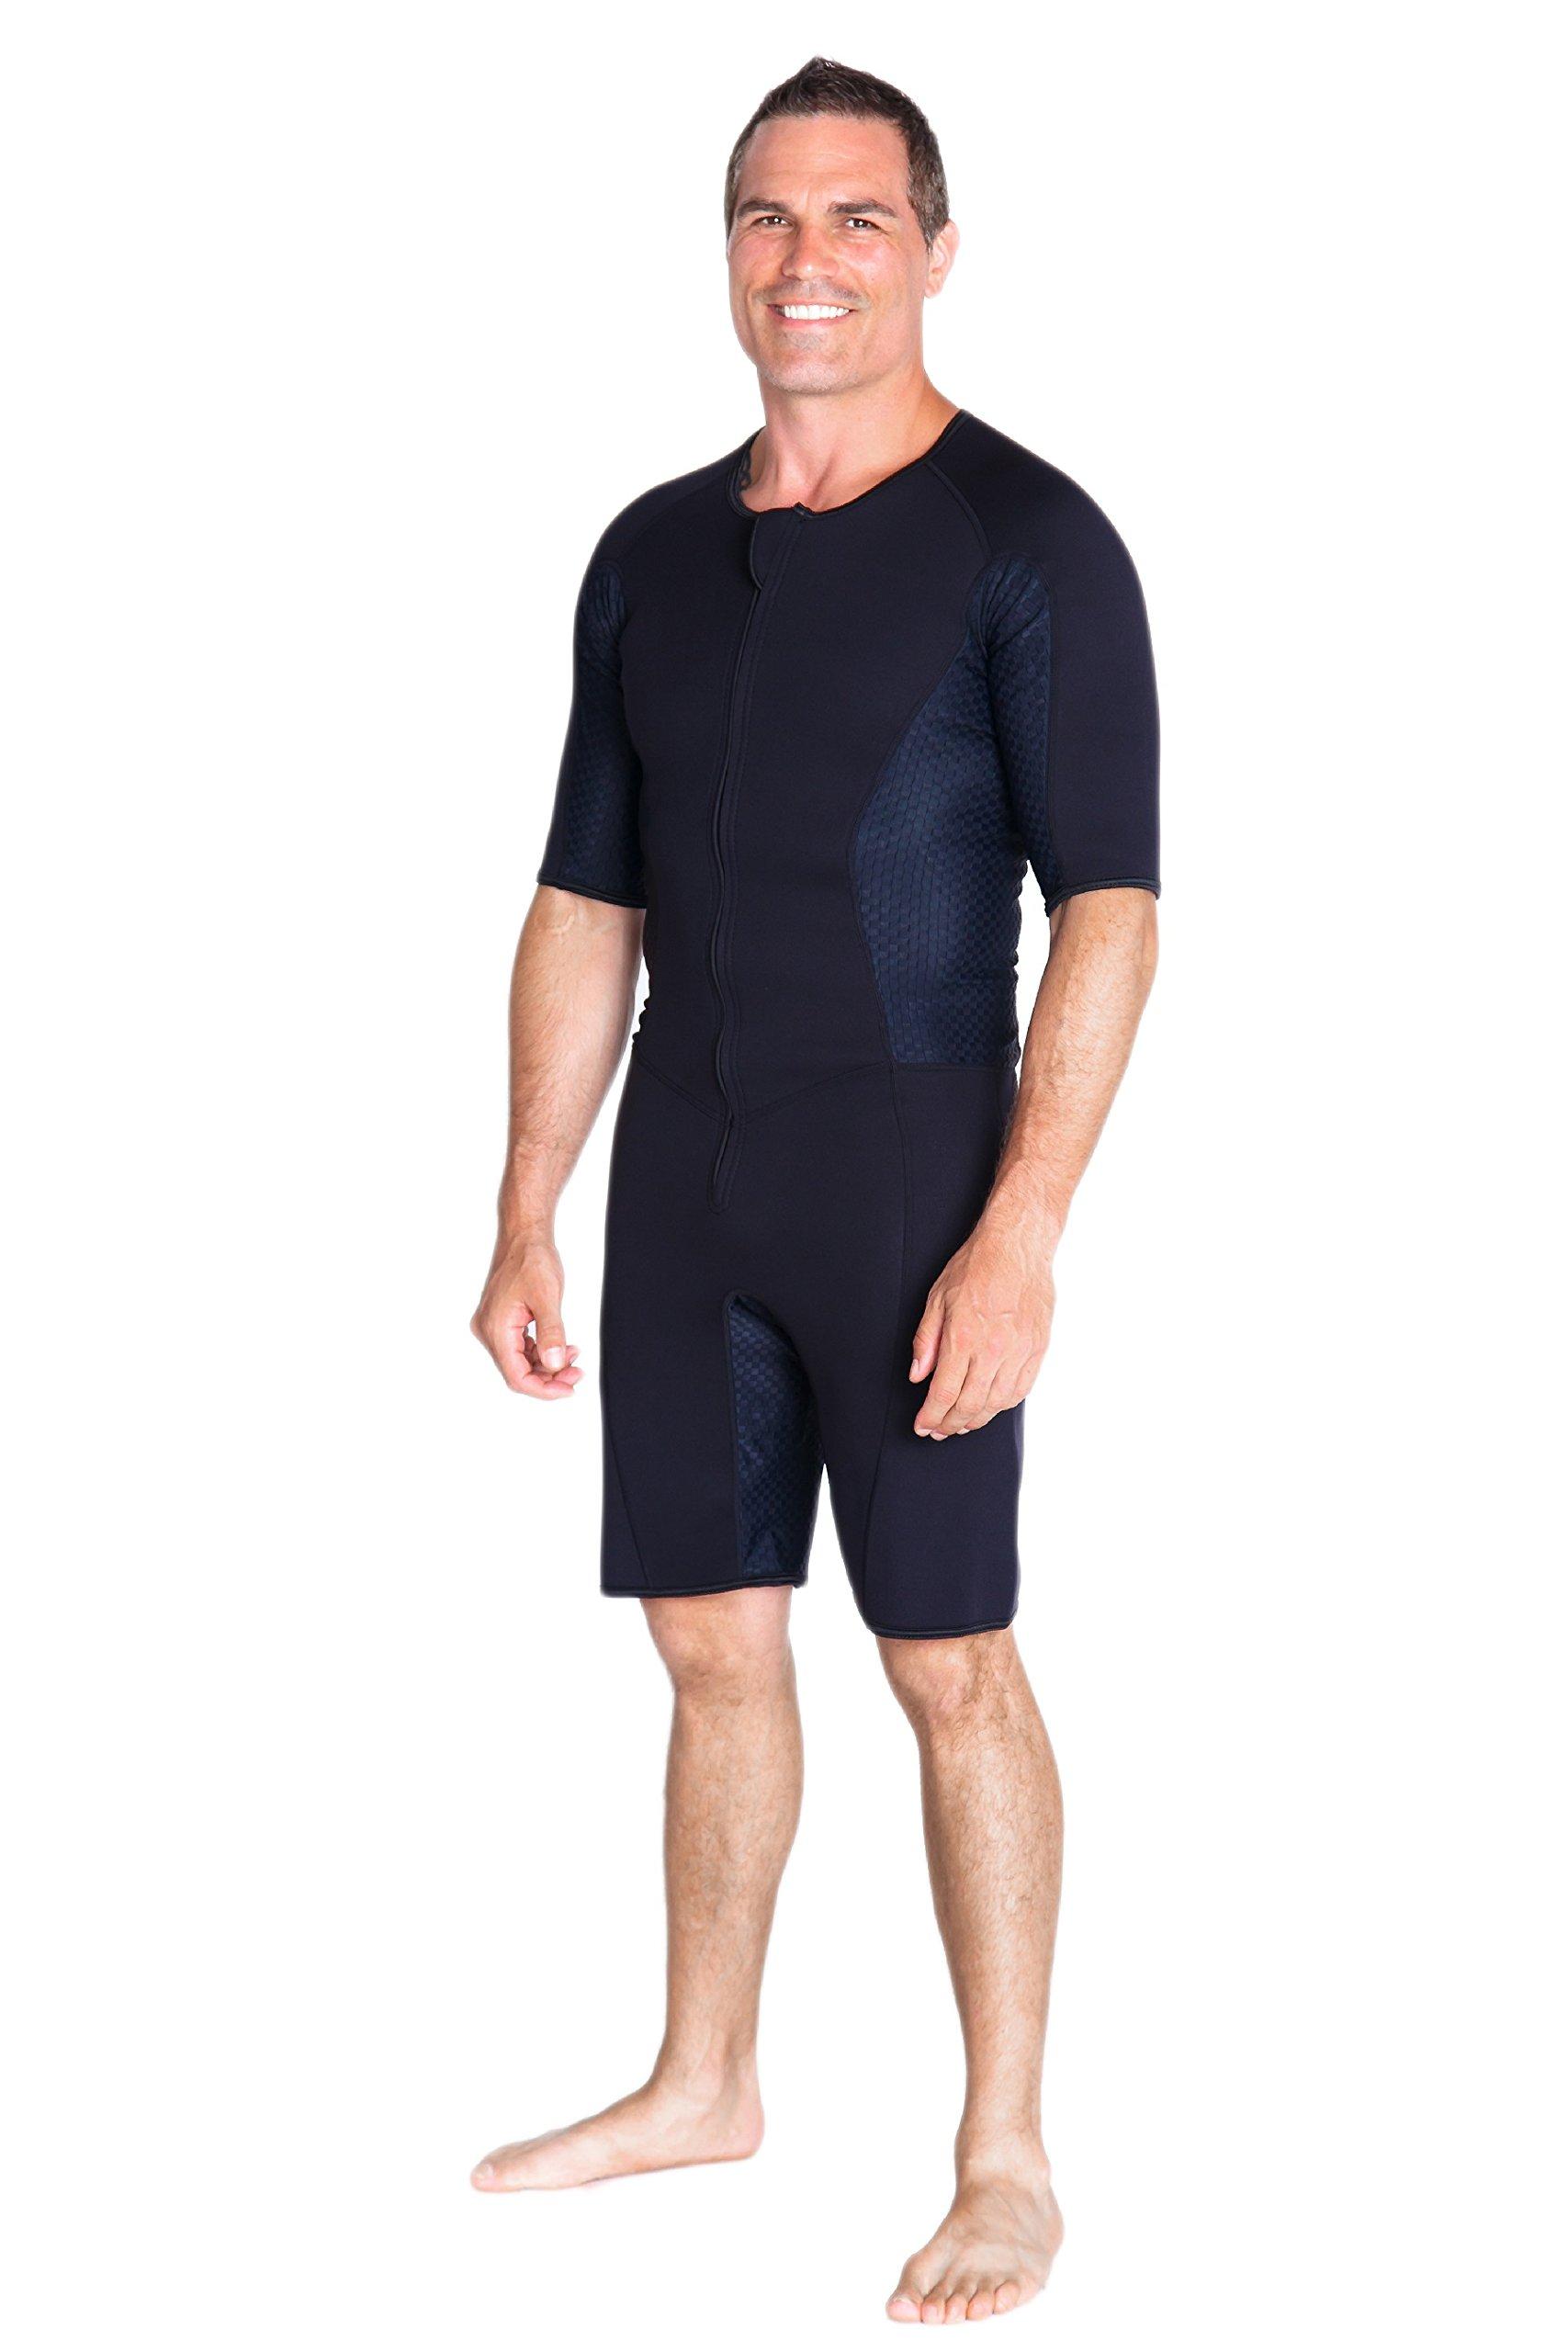 Kutting Weight Neoprene Weight Loss Men's & Women's Sauna Suit (Black, XL) by Kutting Weight (Image #2)